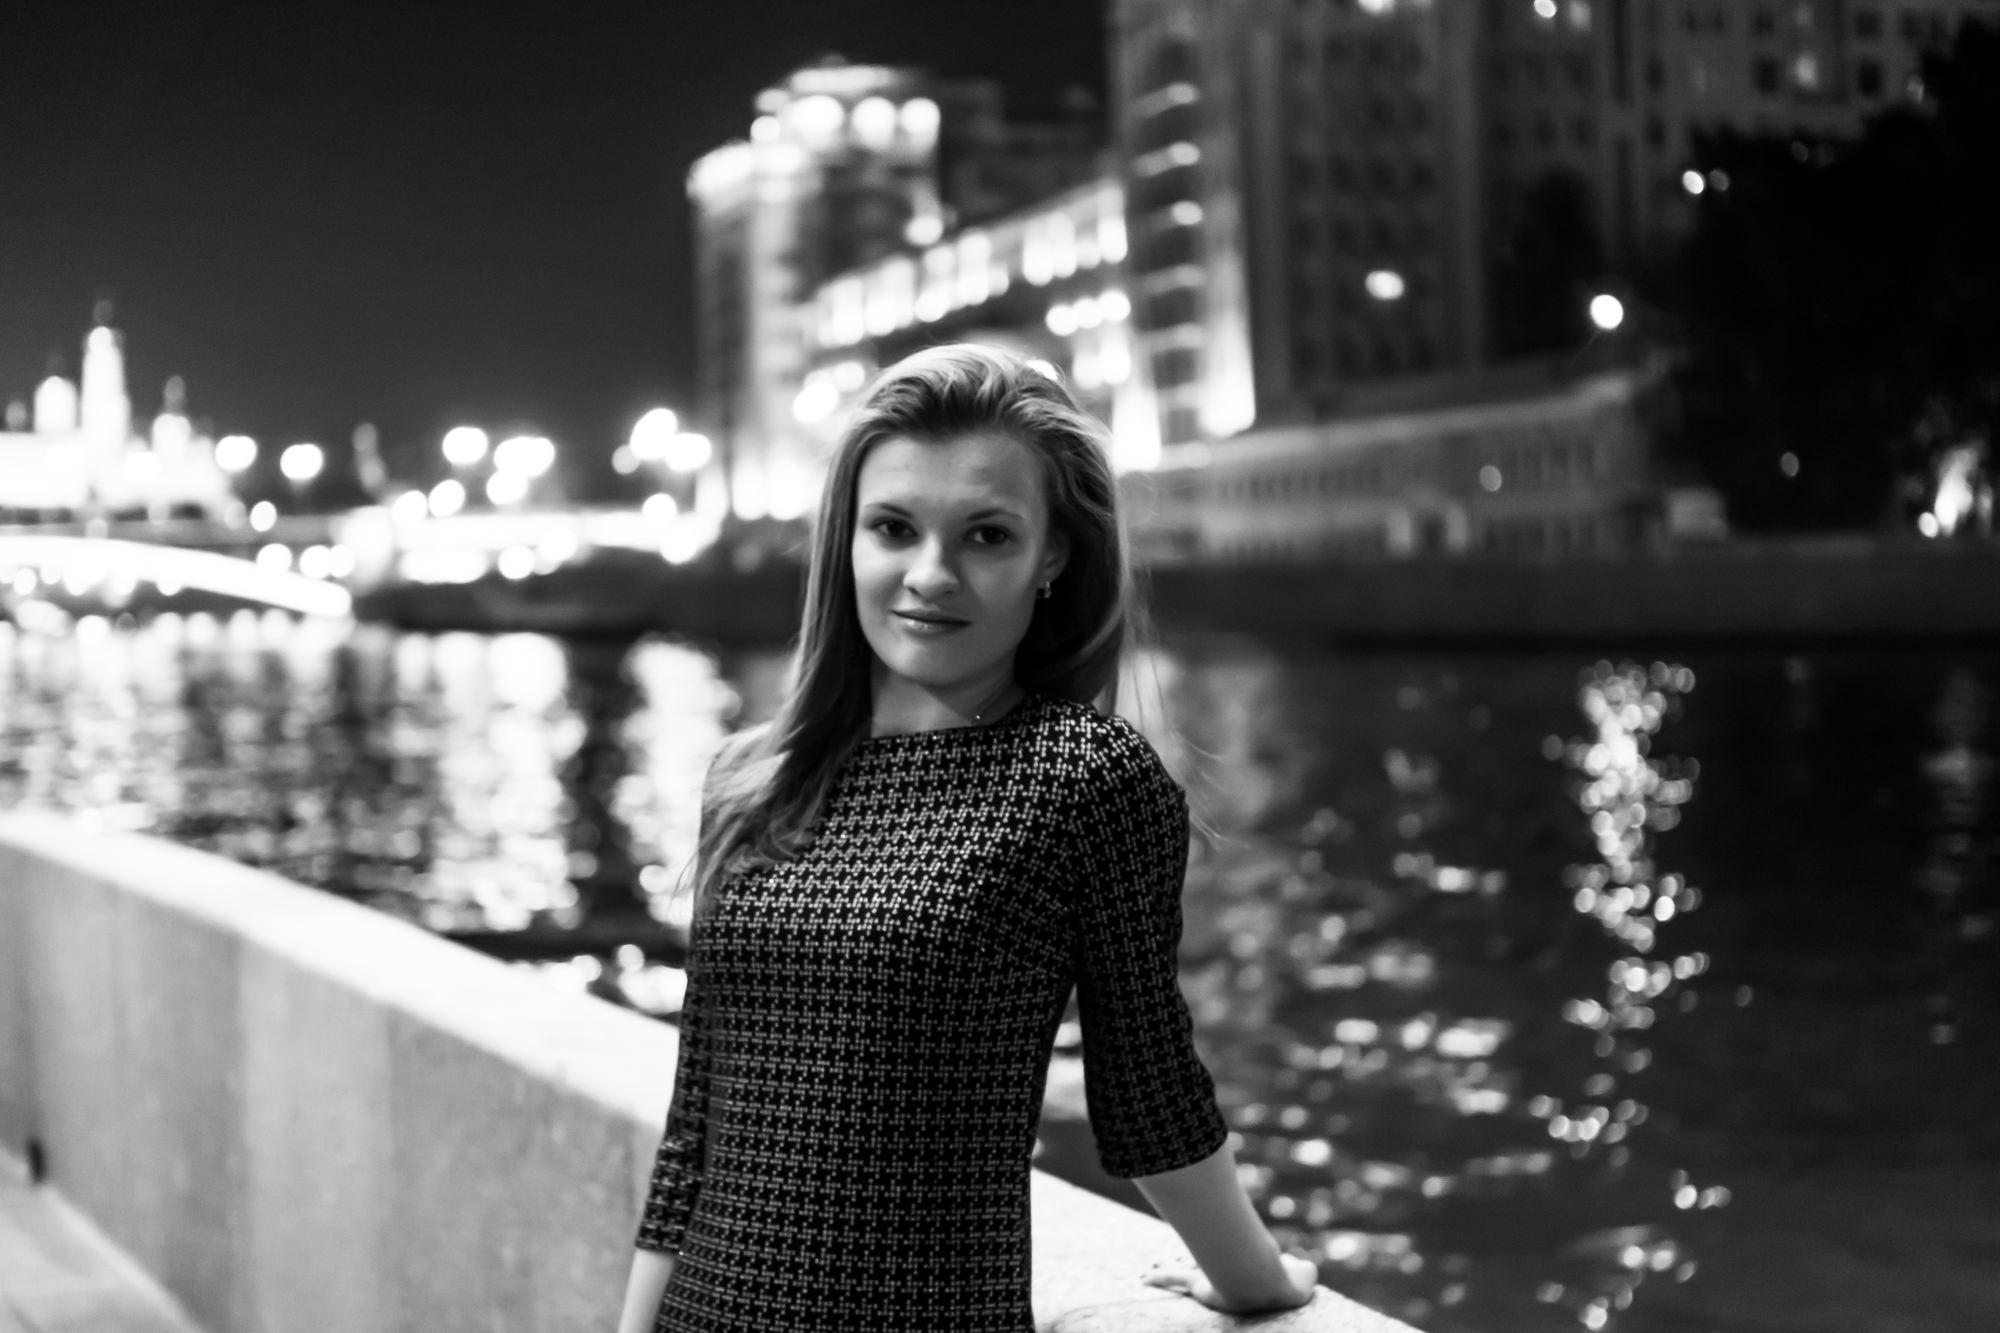 wo Fotos in Moskau?